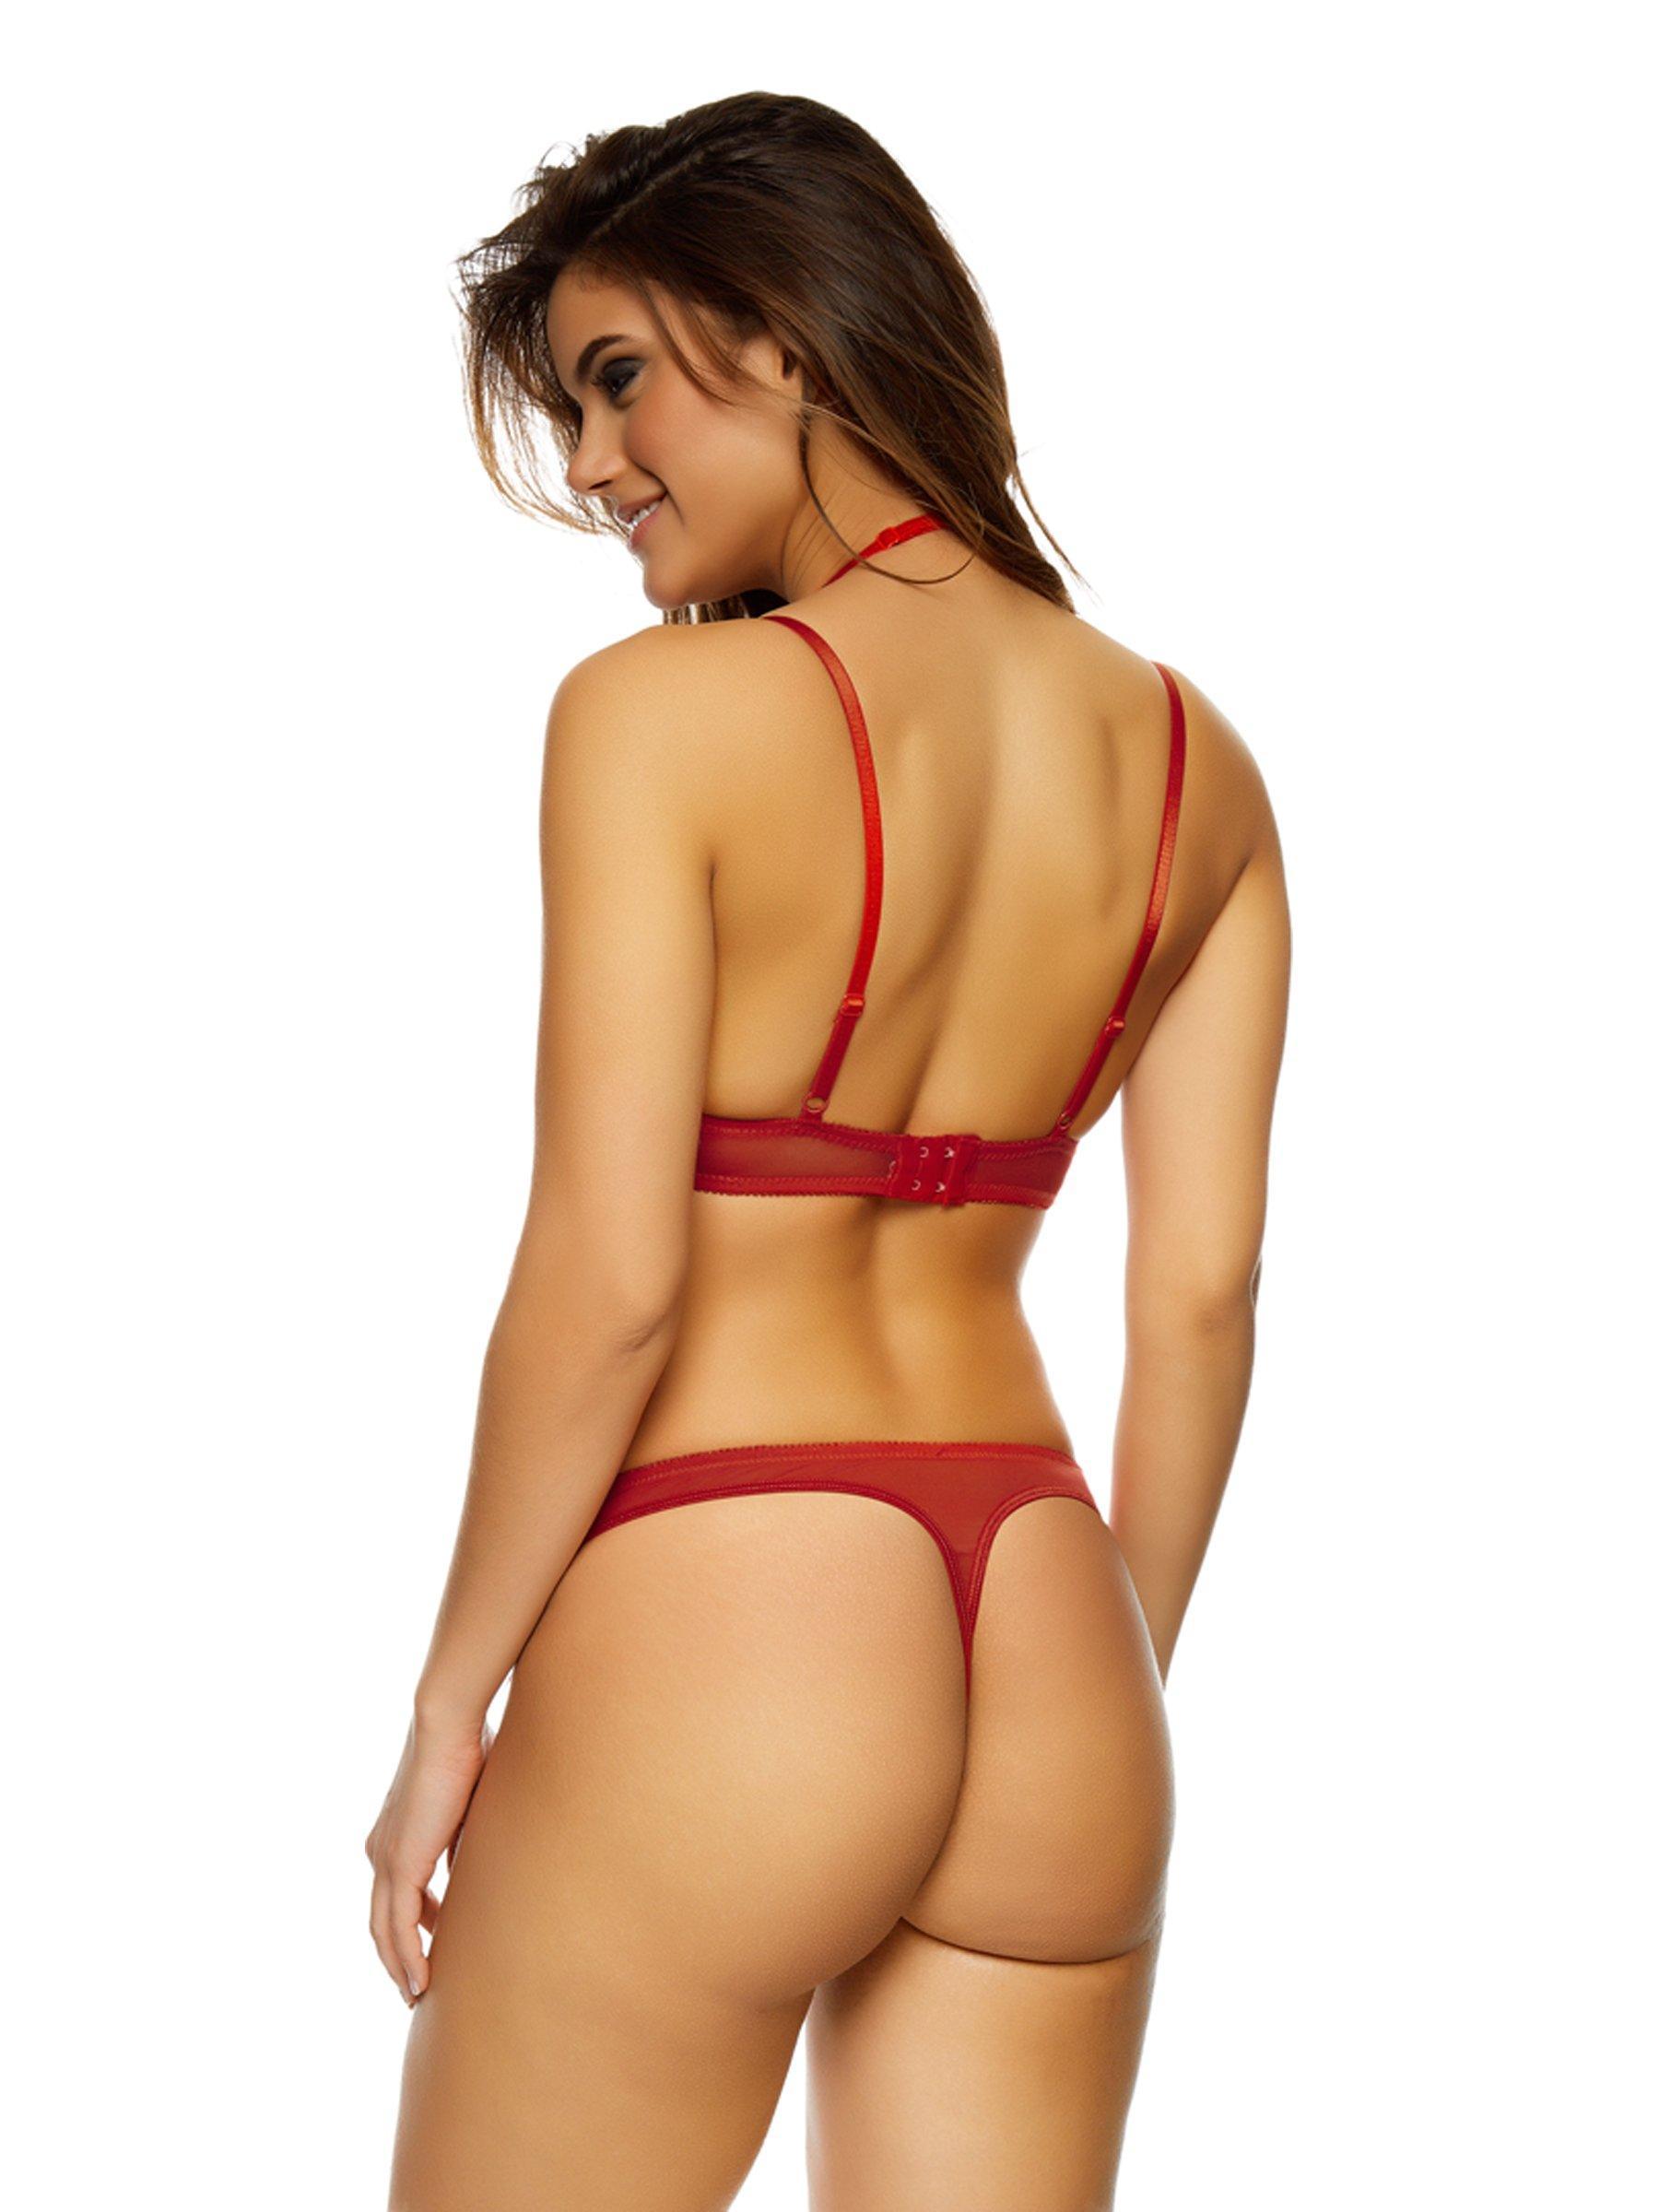 Ann Summers Womens Elana Quarter Cup Bra Red Underwired Sexy ...